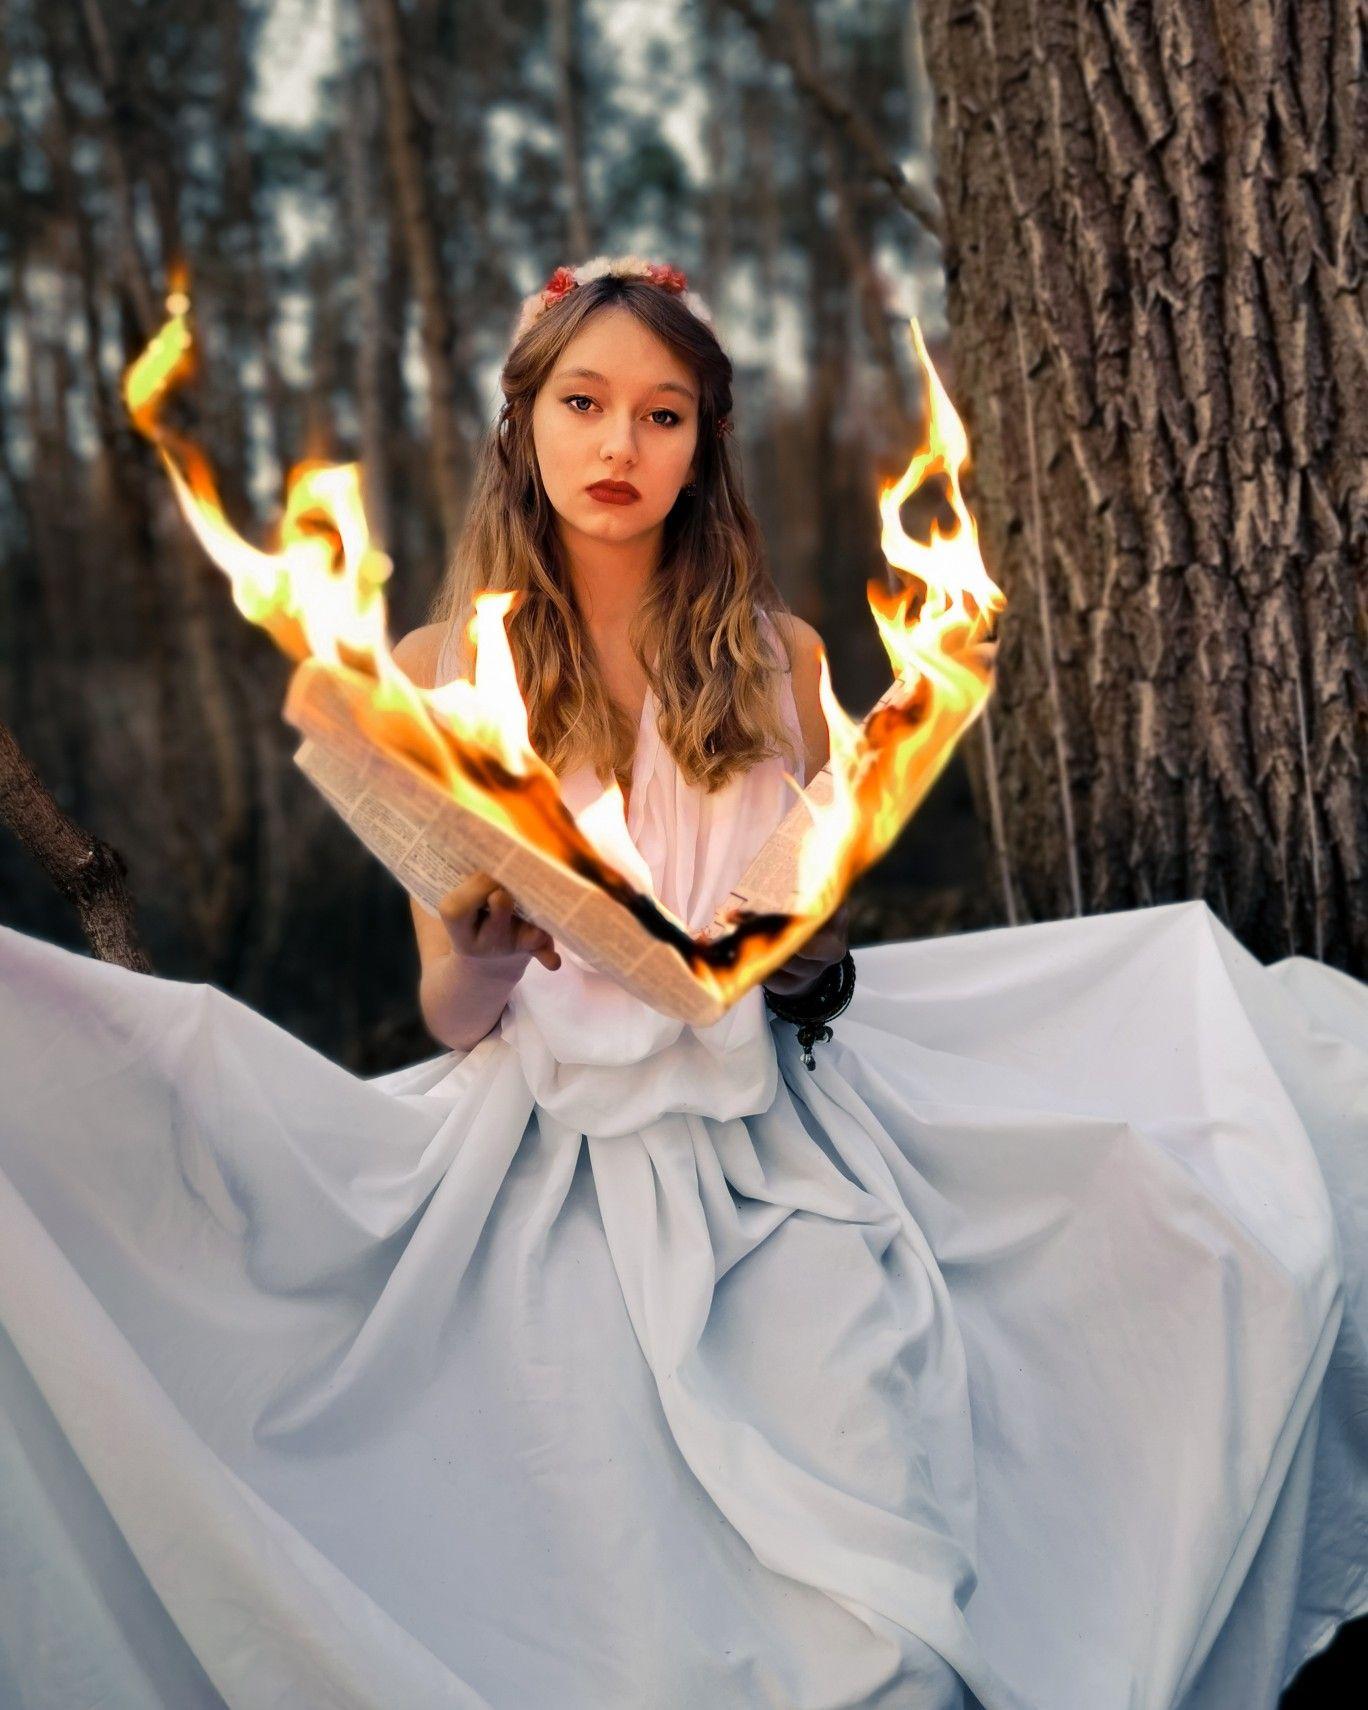 Фото с огнём kramer model